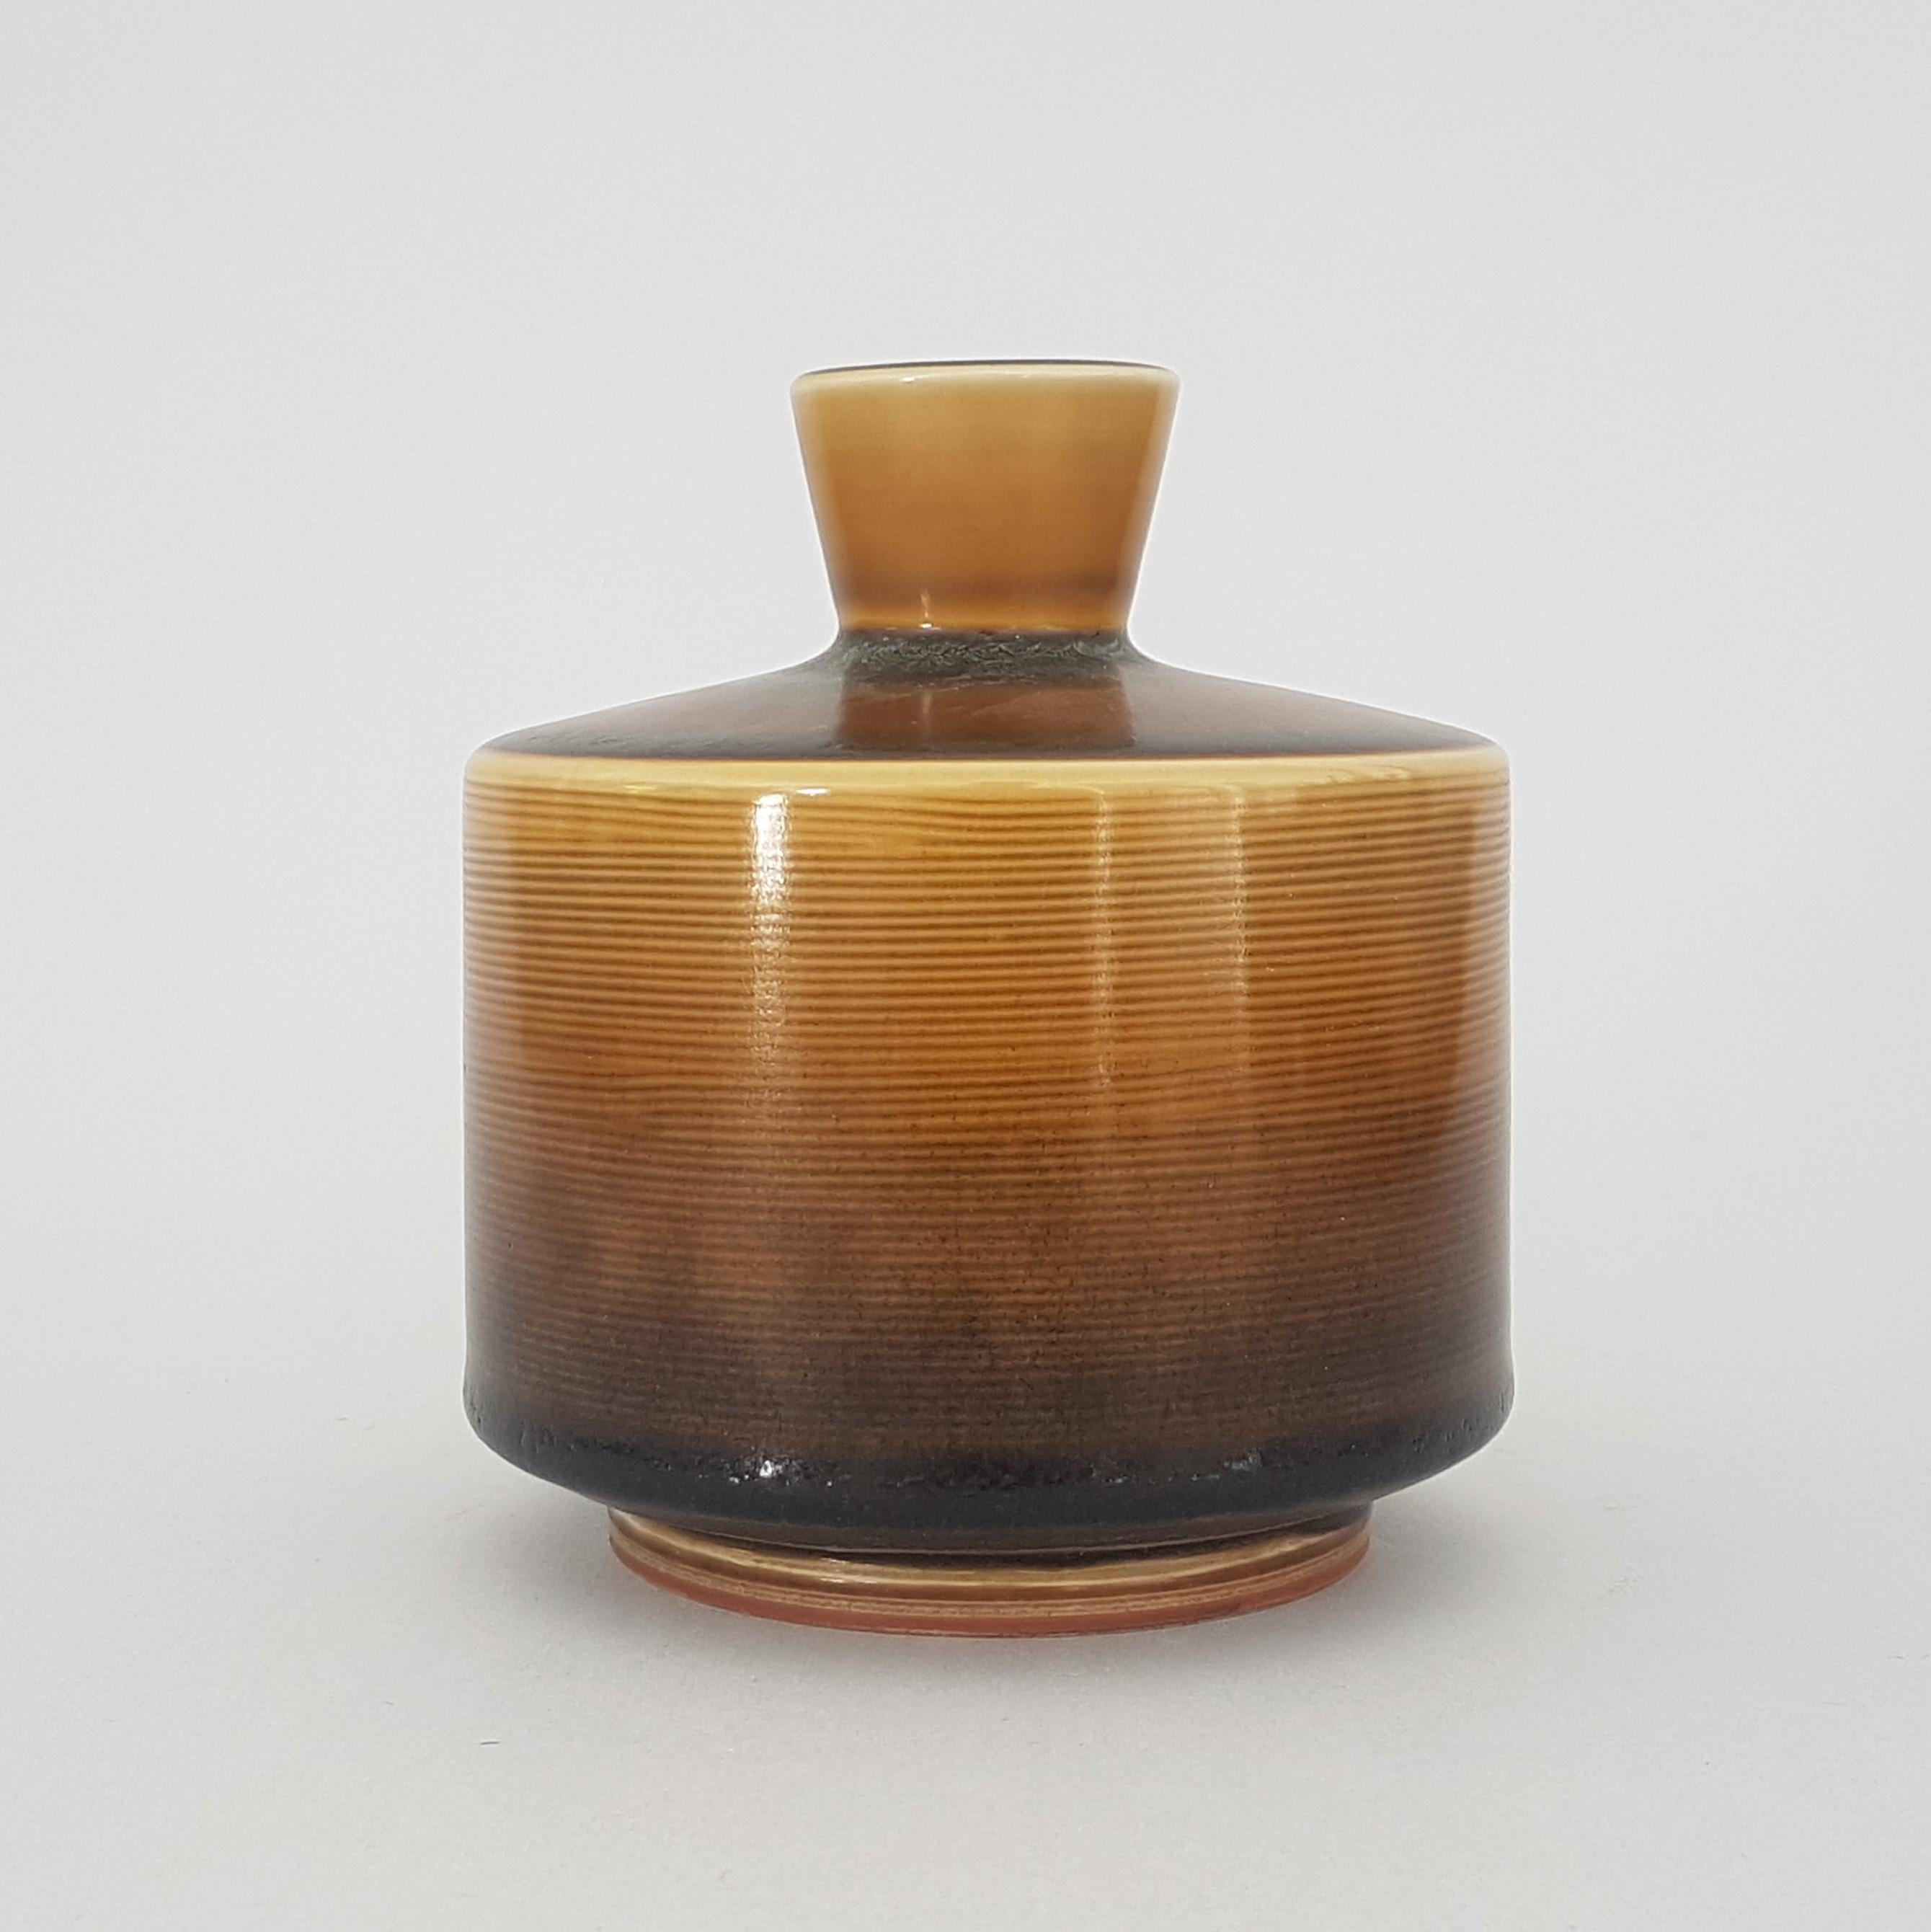 Berndt Friberg Gustavsberg Quot Unique Footed Stoneware Vase